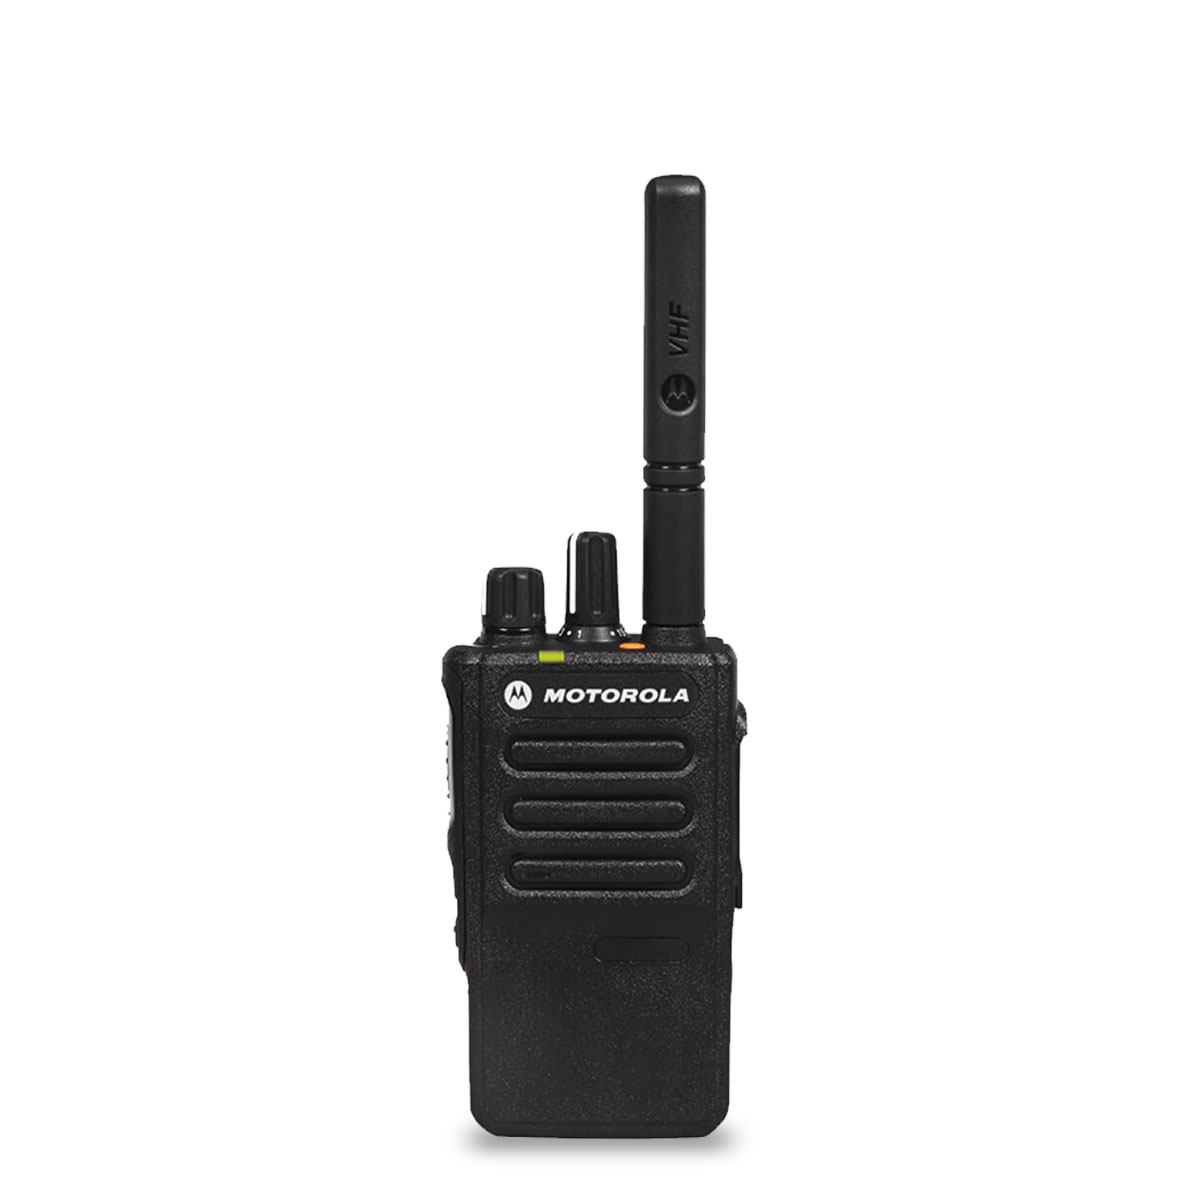 Radio Motorola DGP8050e Elite Digital LAH69JDC9RA1AN VHF 136-174 MHz